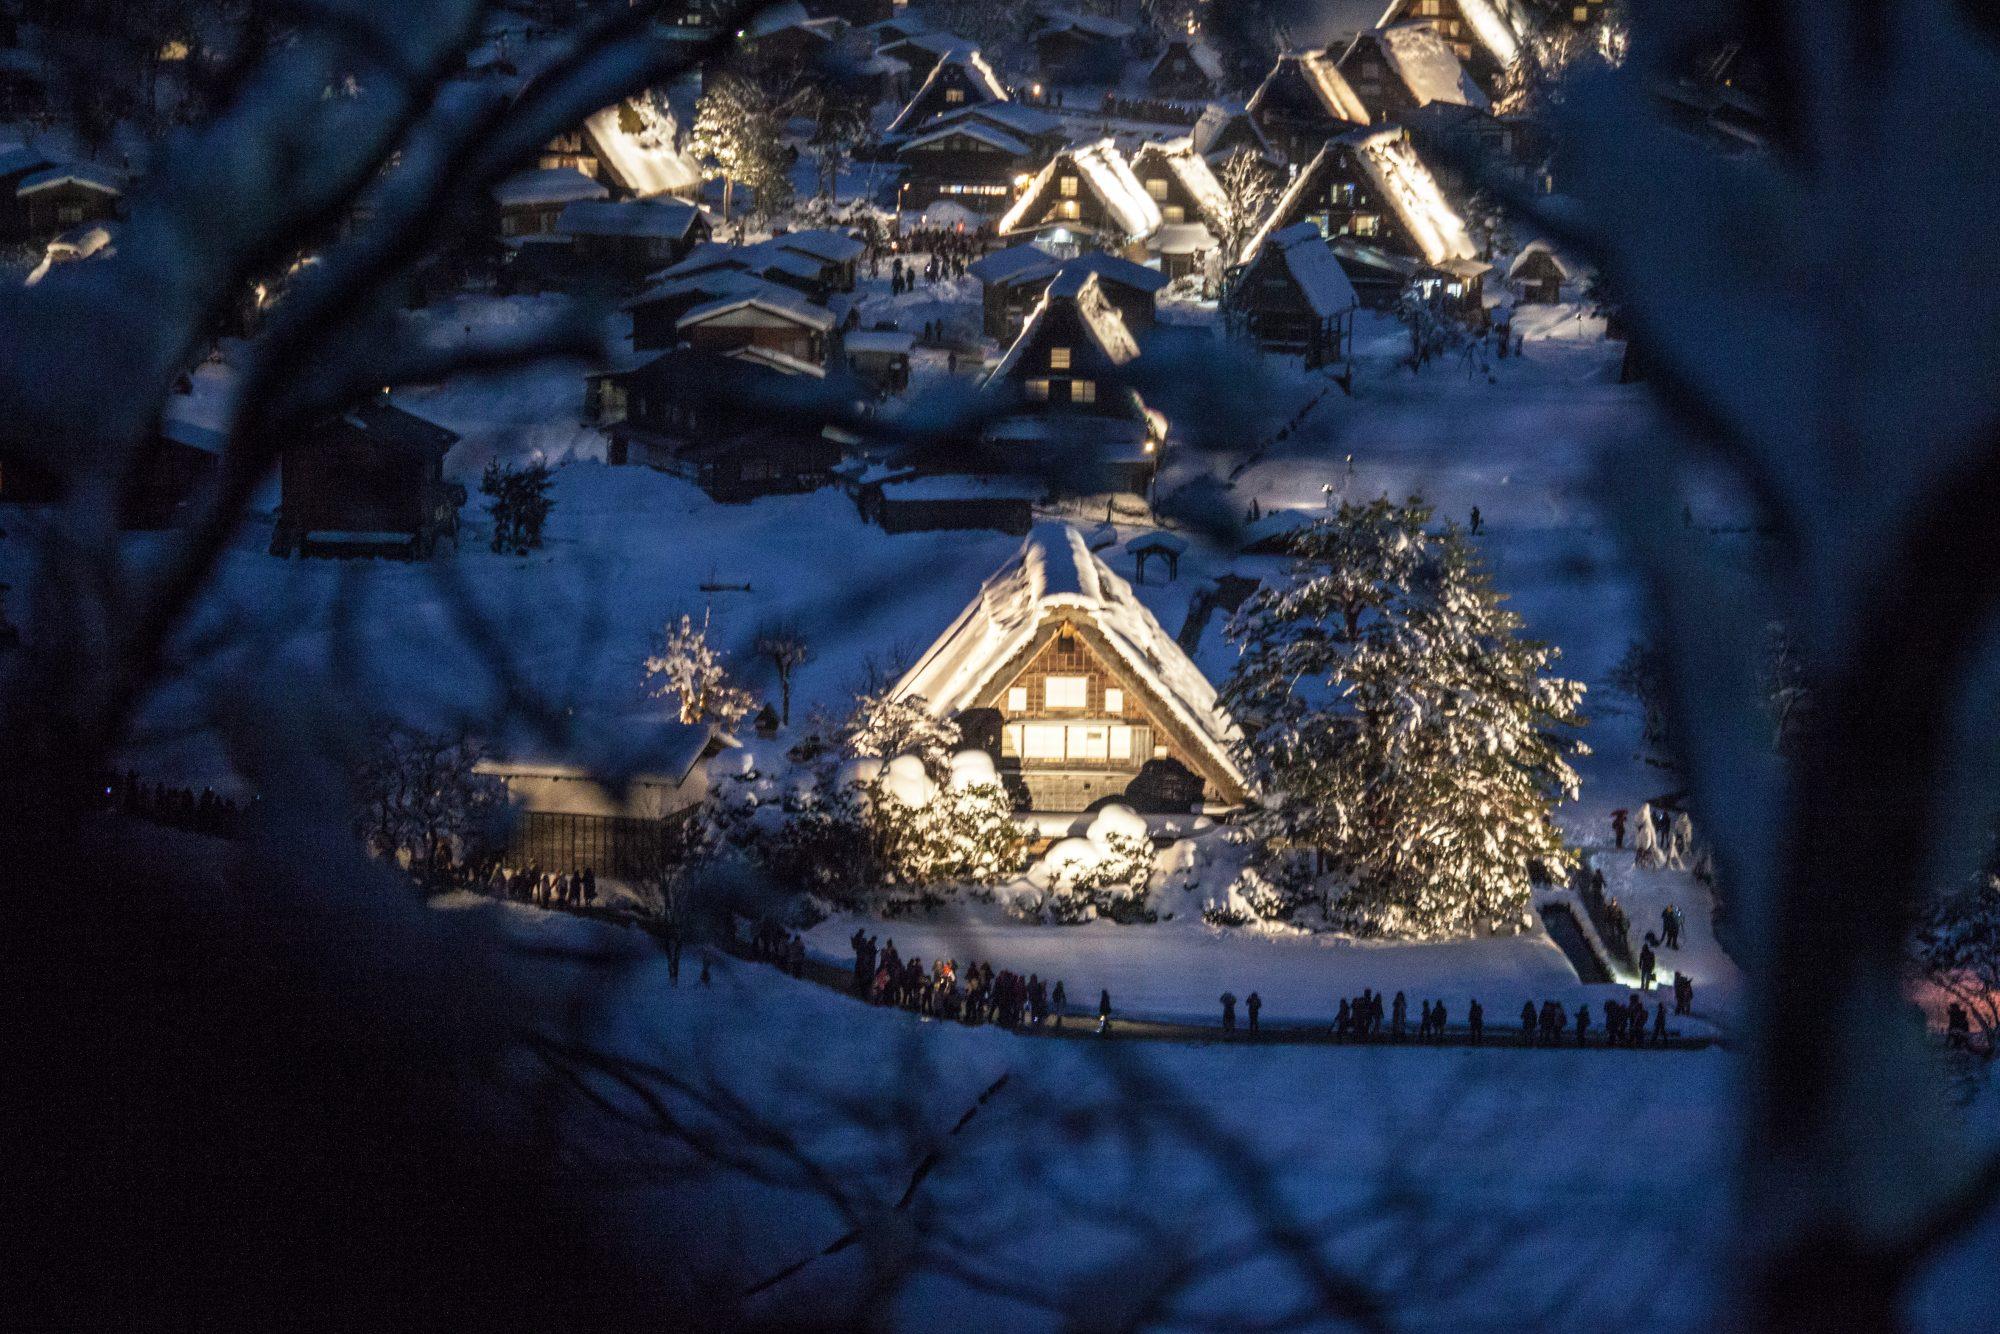 Shirakawa Go Winter Illumination